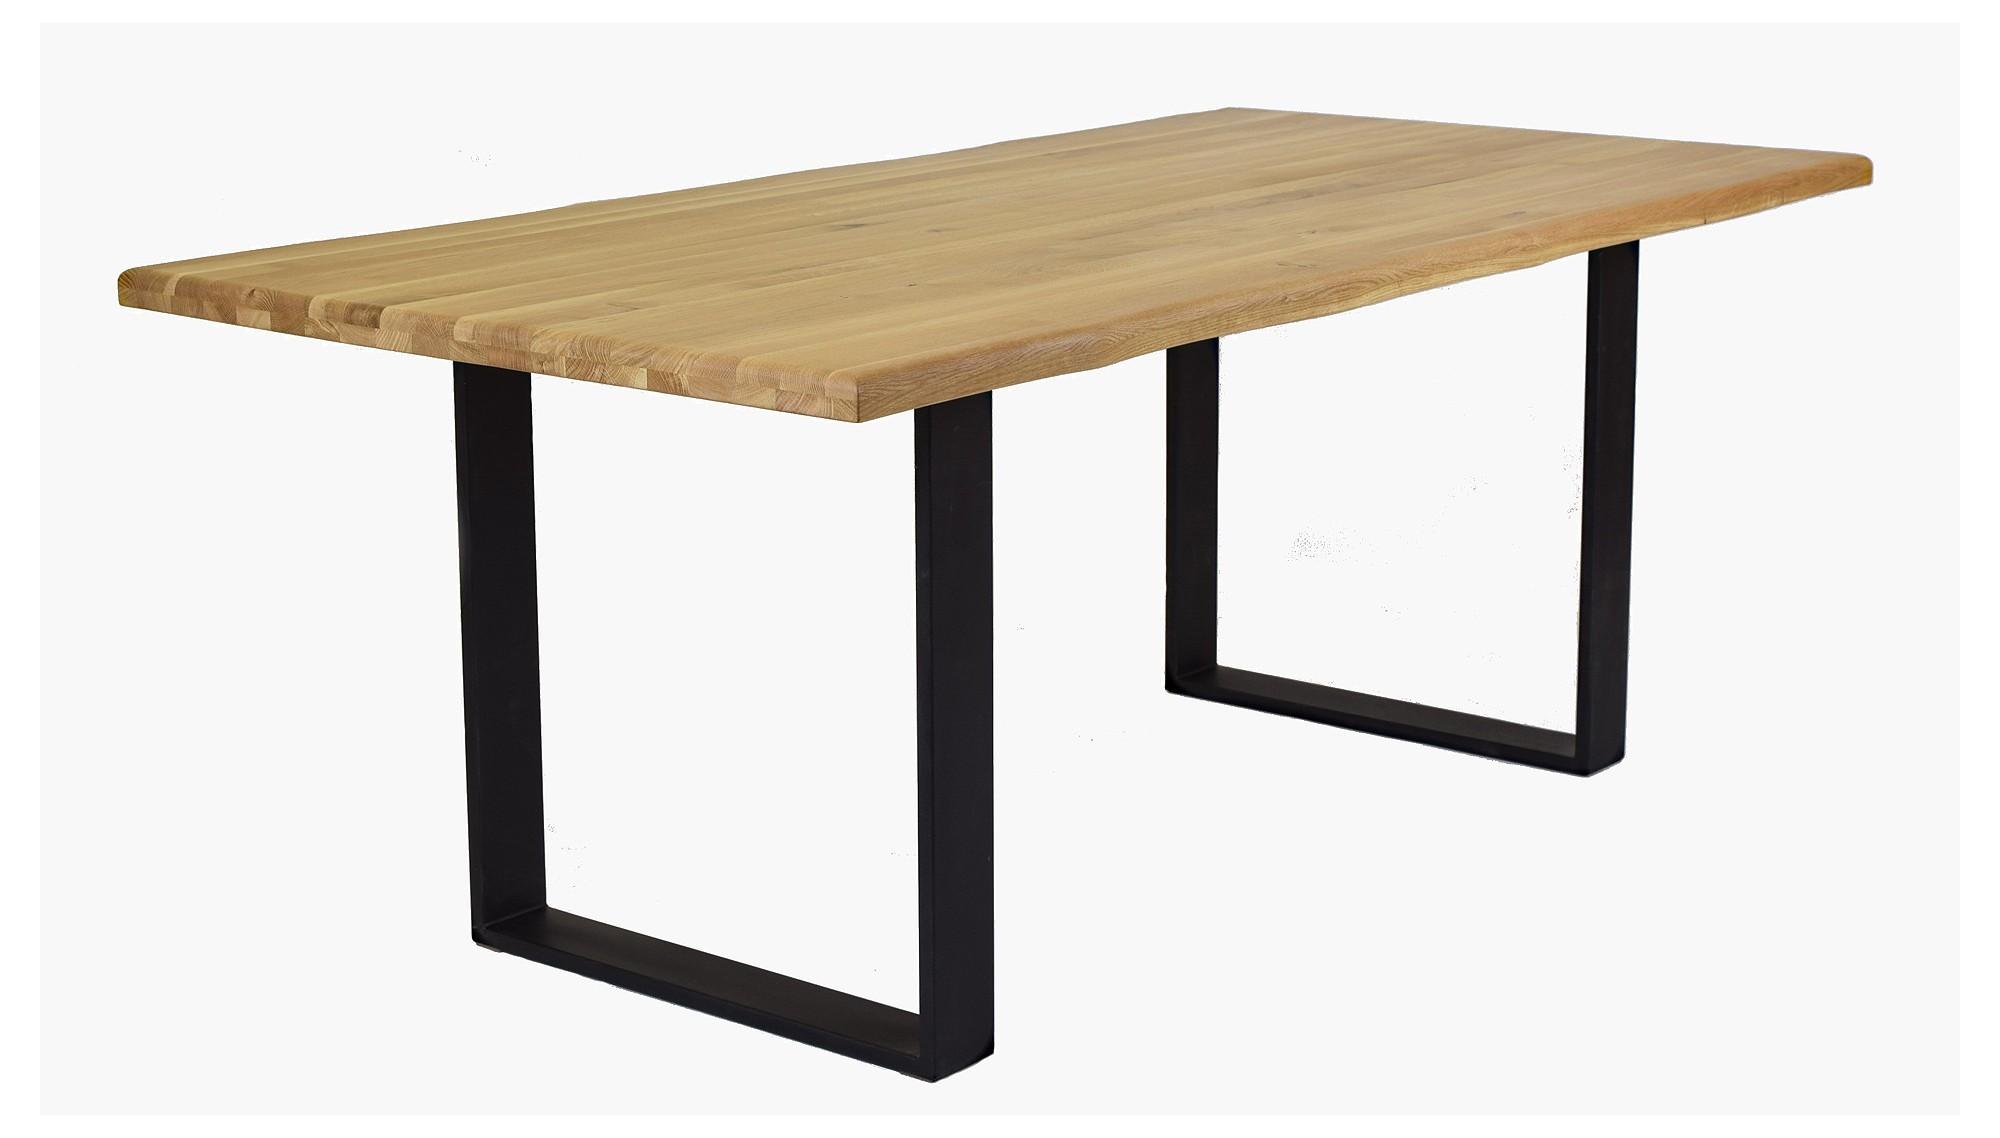 Jedálenský dubový stôl  c3f1efadb5e